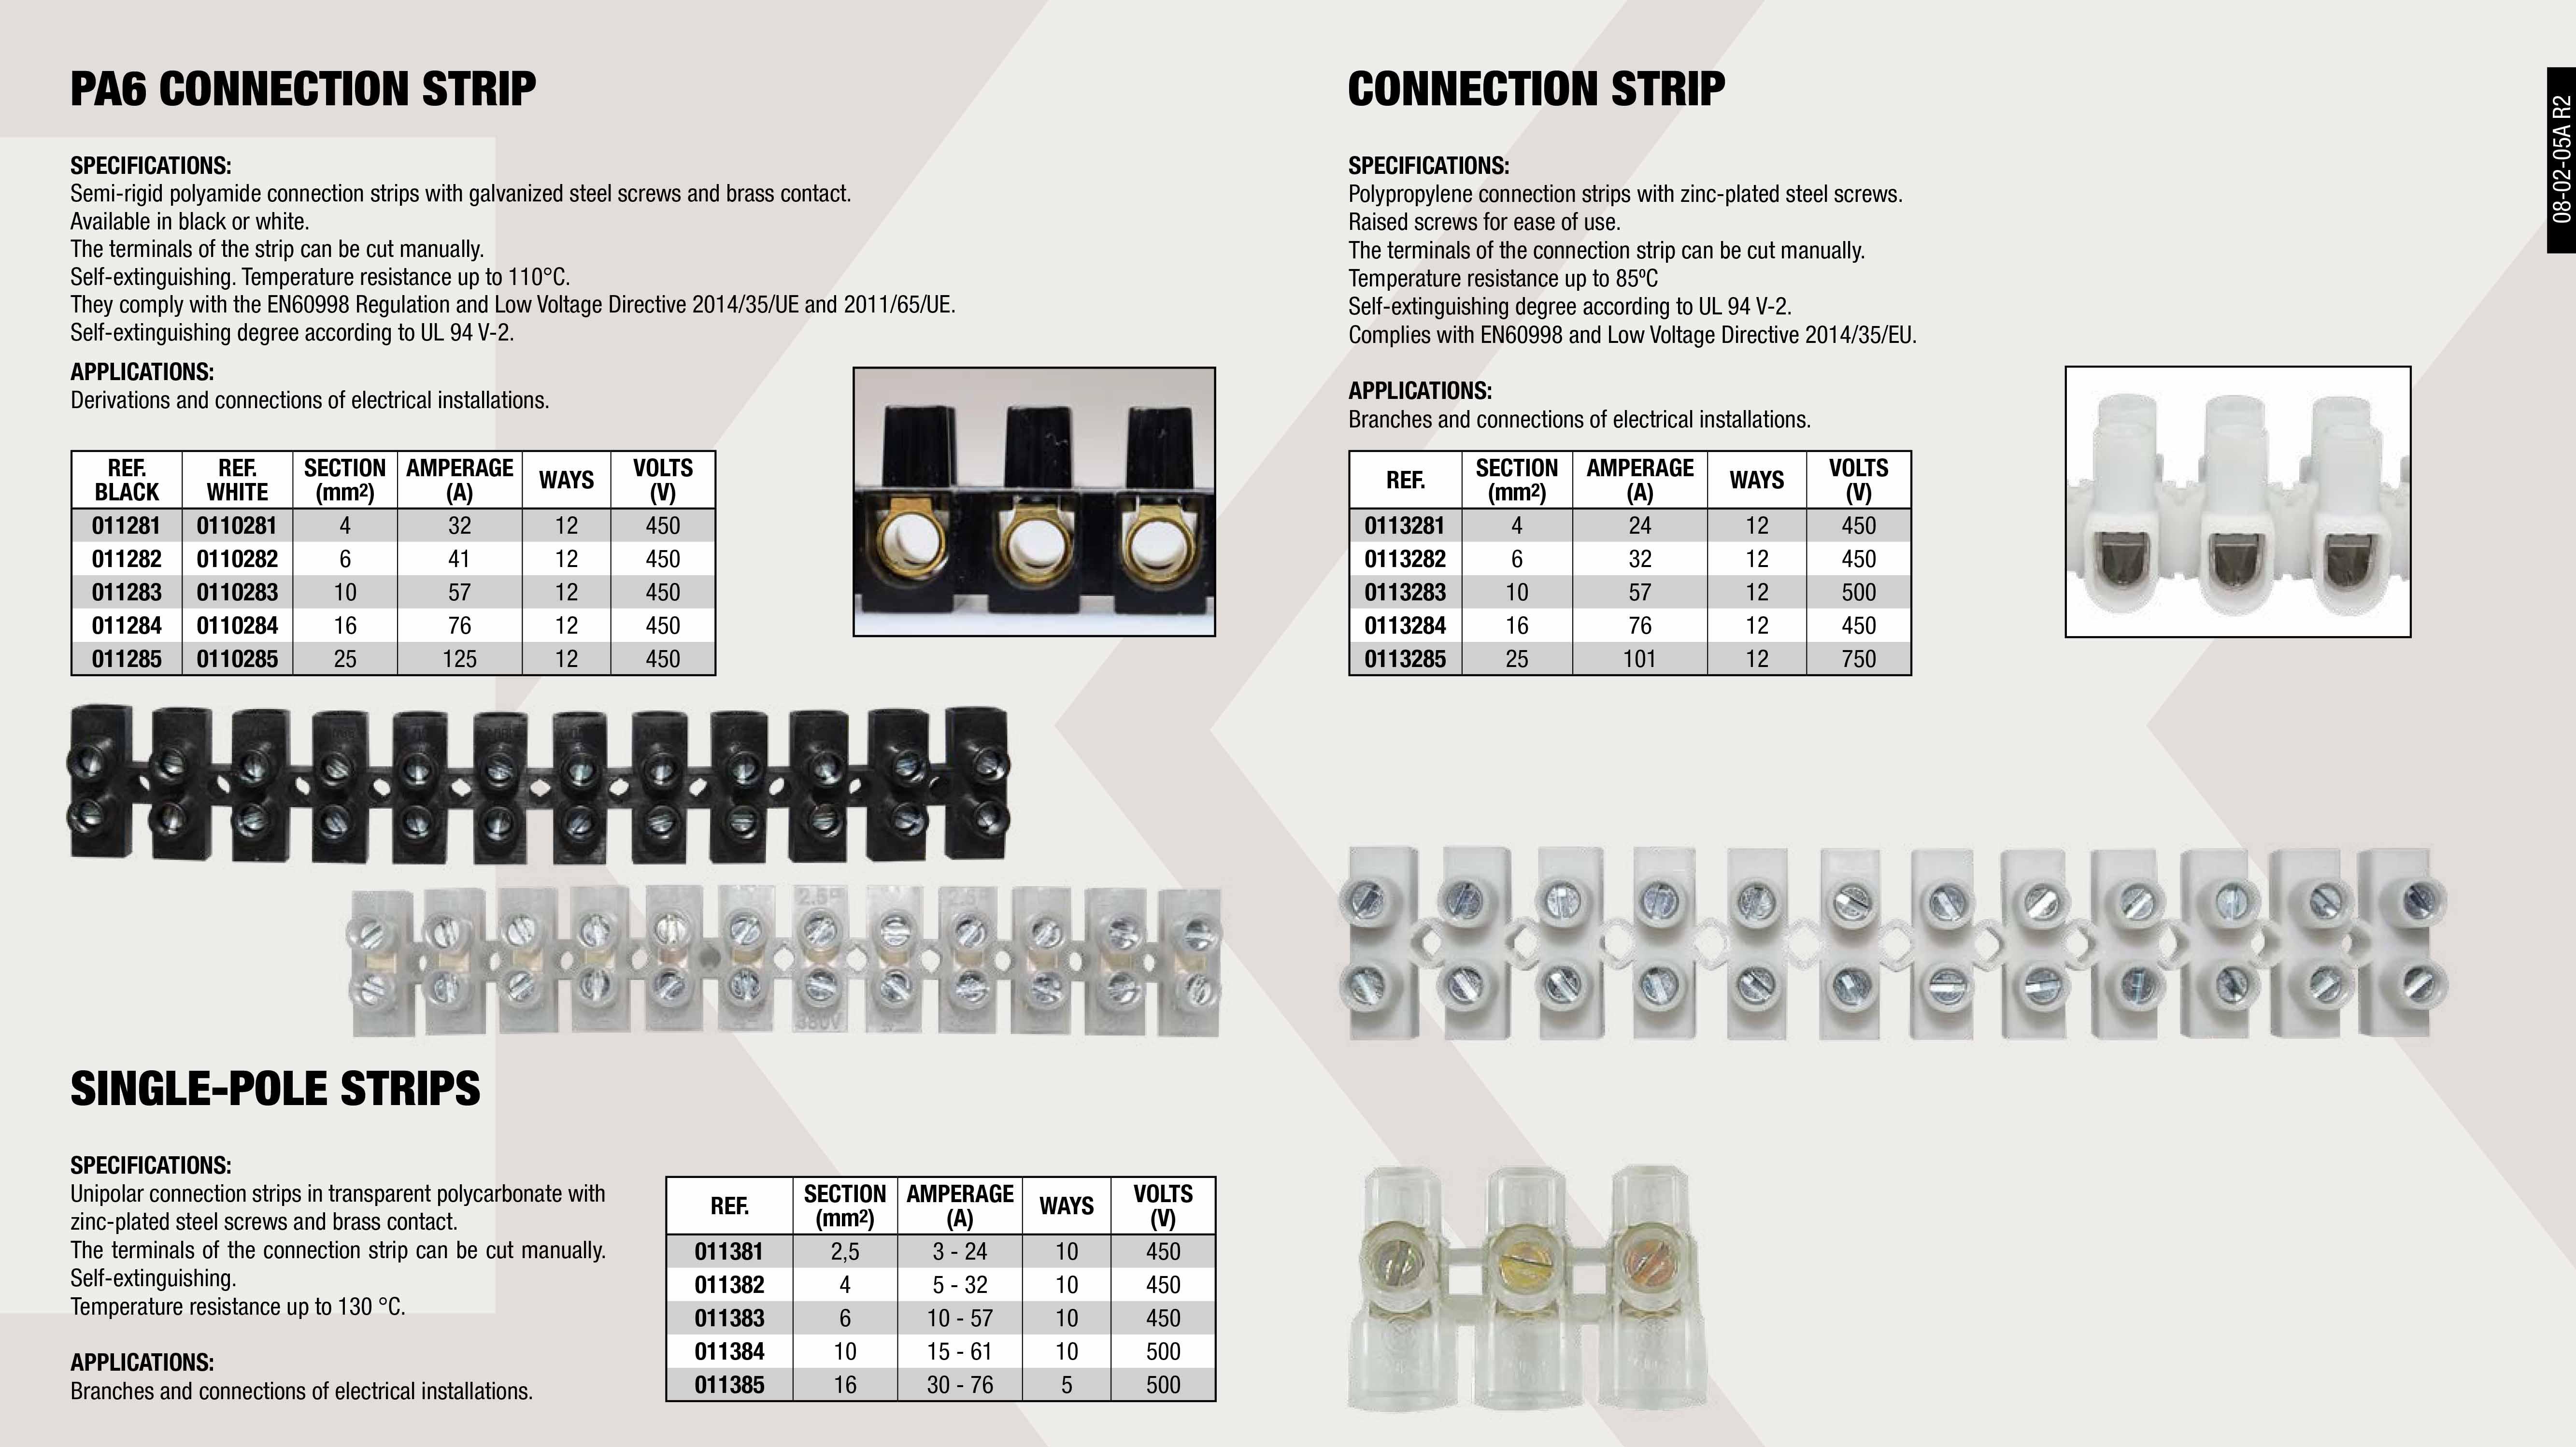 12 CONNECTIONS                                              ,  UNIPOLAR TERMINAL BLOCK 6MM 10 CONNECTIONS                  ,  UNIPOLAR TERMINAL BLOCK 16MM 5 CONNECTIONS                  ,  TERMINAL STRIP NATURAL 25MM 12 CONNECTIONS                  ,  TERMINAL STRIP BLACK 10MM 12 CONNECTIONS                    ,  UNIPOLAR TERMINAL BLOCK 4MM 10 CONNECTIONS                  ,  TERMINAL 16MM 10 CONNECTIONS                                ,  UNIPOLAR TERMINAL BLOCK 2.5MM 10 CONNECTIONS                ,  TERMINAL 6MM 10 CONNECTIONS                                 ,  TERMINAL 70MM 1 CONNECTION                                  ,  TERMINAL STRIP BLACK 6MM 12 CONNECTIONS                     ,  TERMINAL STRIP NATURAL 4MM 12 CONNECTIONS                   ,  TERMINAL 50MM 1 CONNECTION                                  ,  TERMINAL 35MM 10 CONNECTIONS                                ,  TERMINAL STRIP BLACK 4MM 12 CONNECTIONS                     ,  TERMINAL STRIP BLACK 16MM 12 CONNECTIONS                    ,  TERMINAL STRIP NATURAL 16MM 12 CONNECTIONS                  ,  UNIPOLAR TERMINAL BLOCK 10MM 10 CONNECTIONS                 ,  TERMINAL 25MM 10 CONNECTIONS                                ,  TERMINAL STRIP BLACK 25MM 12 CONNECTIONS                    ,  TERMINAL STRIP NATURAL 6MM 12 CONNECTIONS                   ,  TERMINAL 10MM 10 CONNECTIONS                                ,